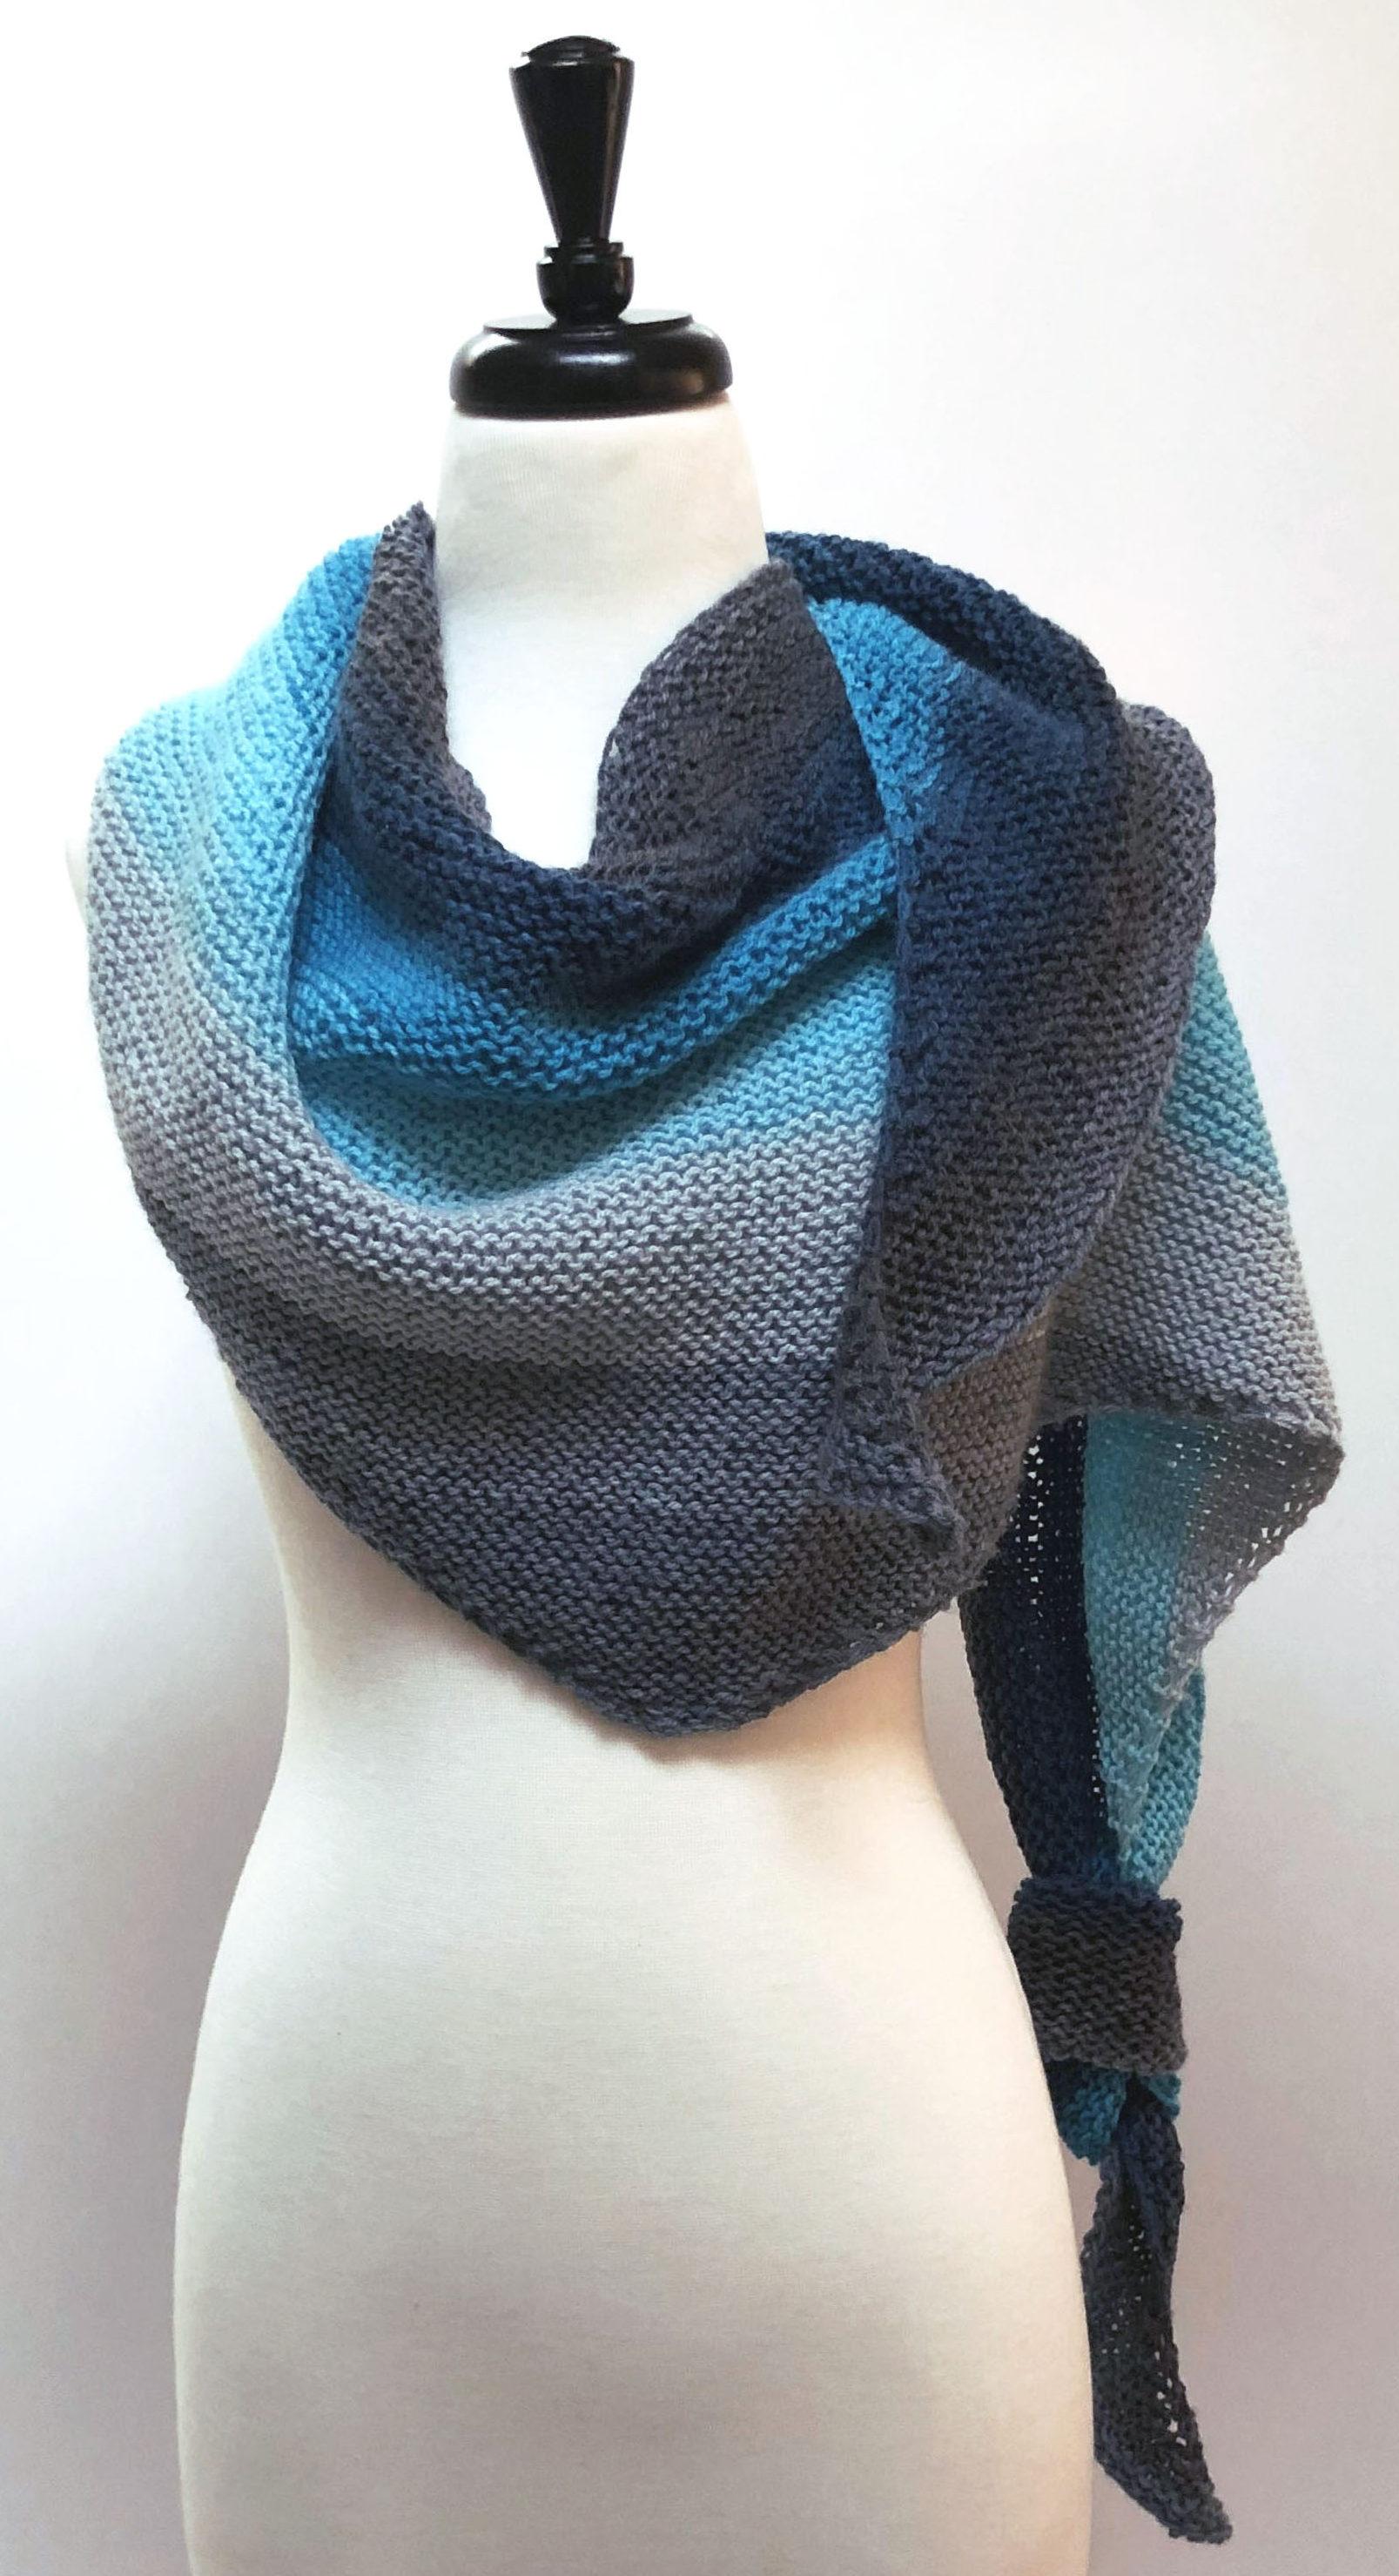 Beginner's best – Shawl One free knit pattern